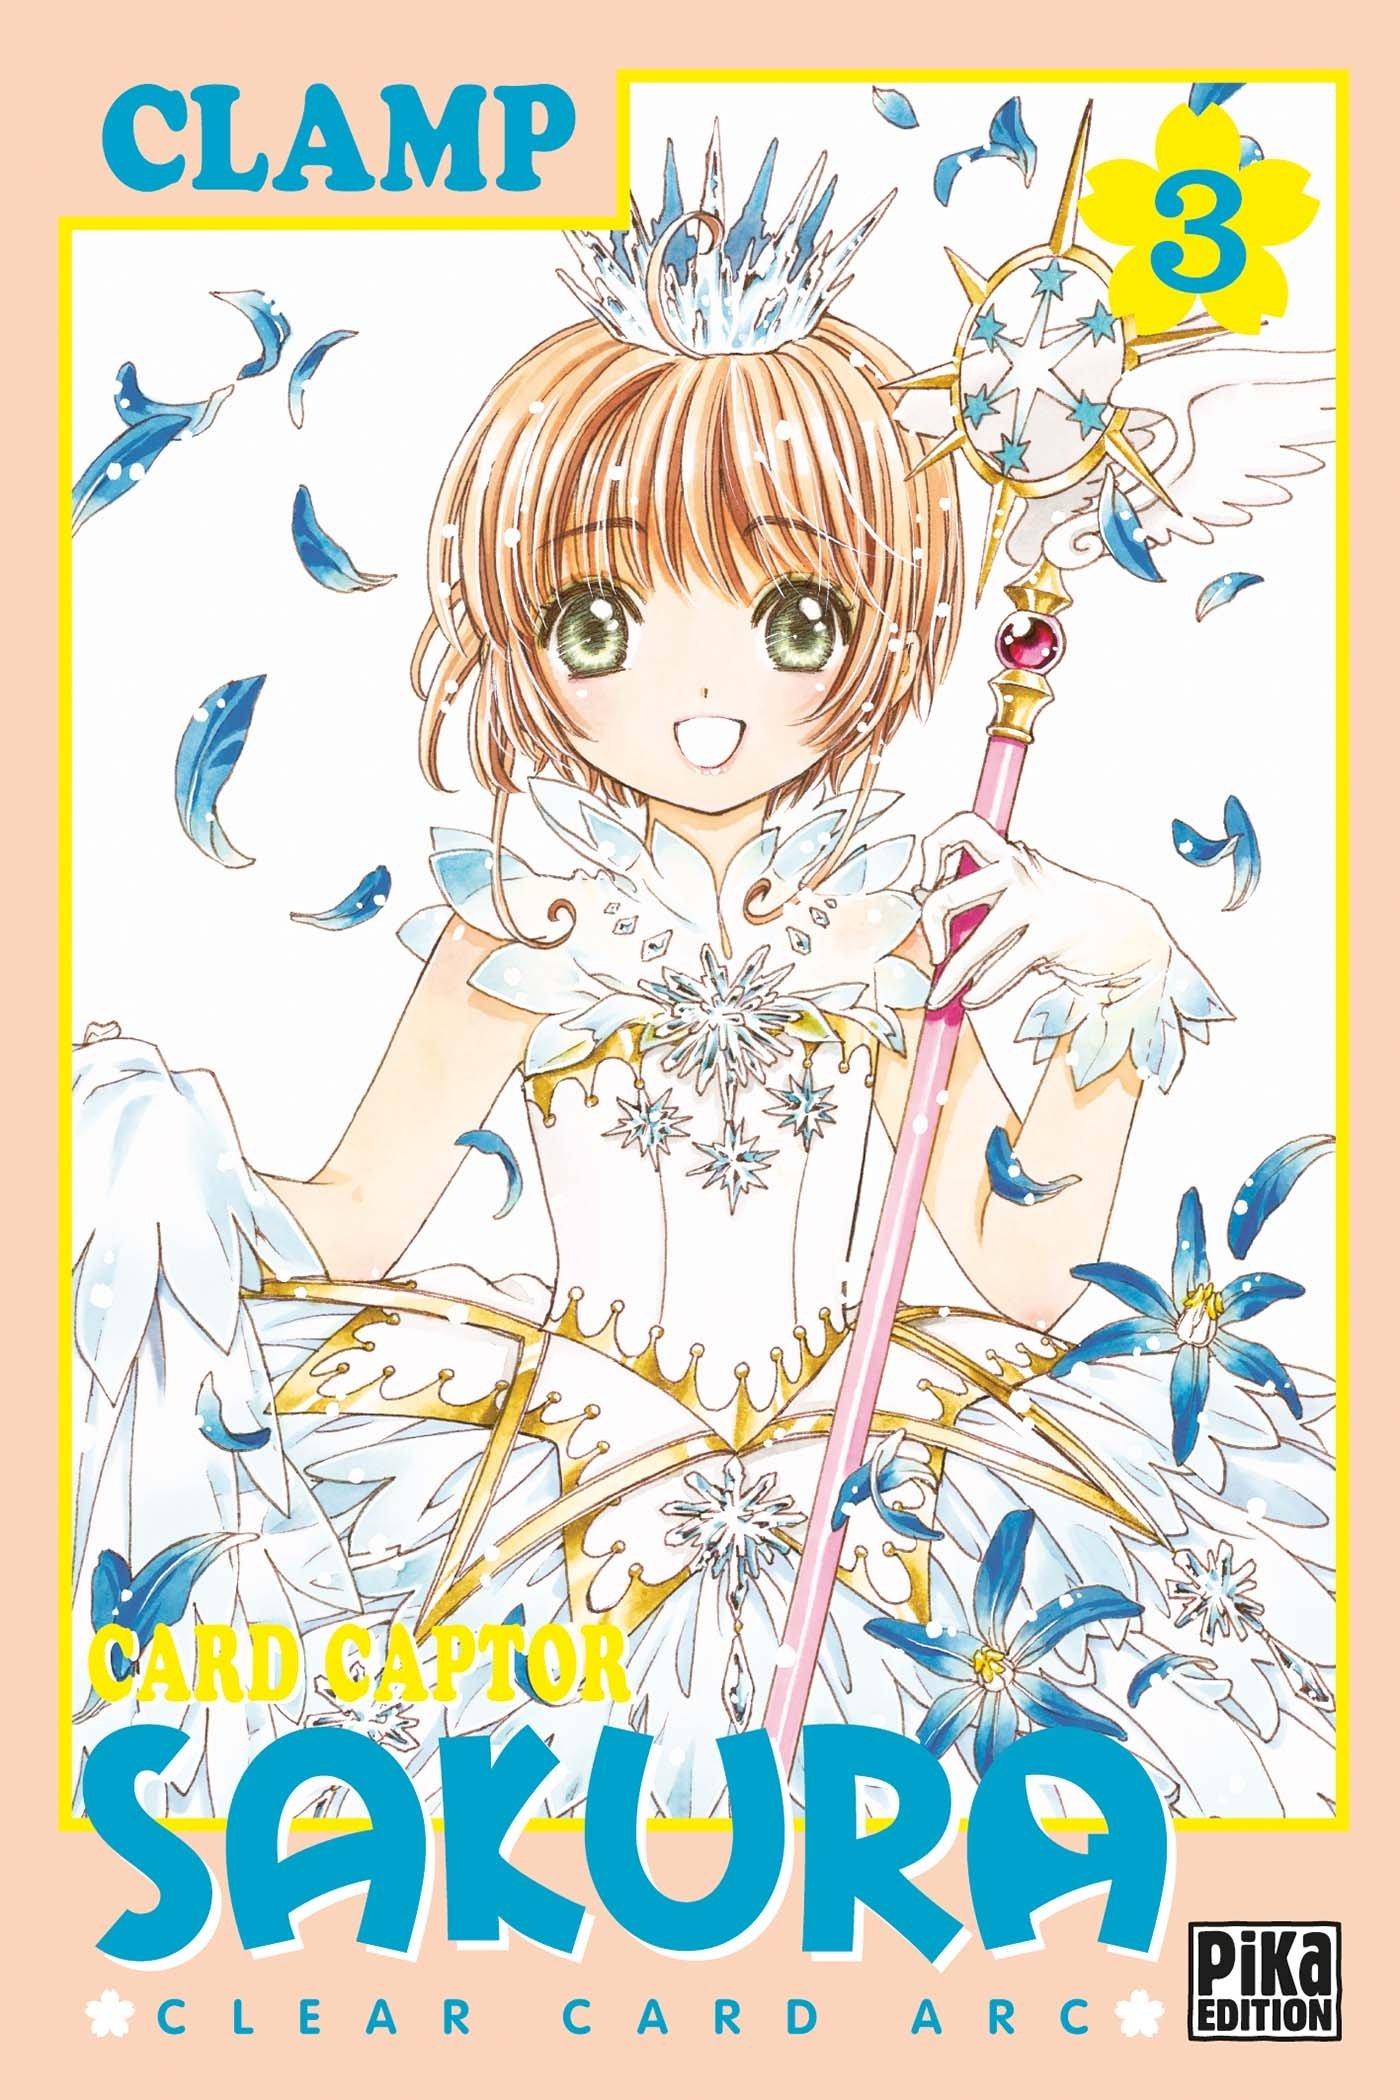 Card captor Sakura - Clear Card Arc 3